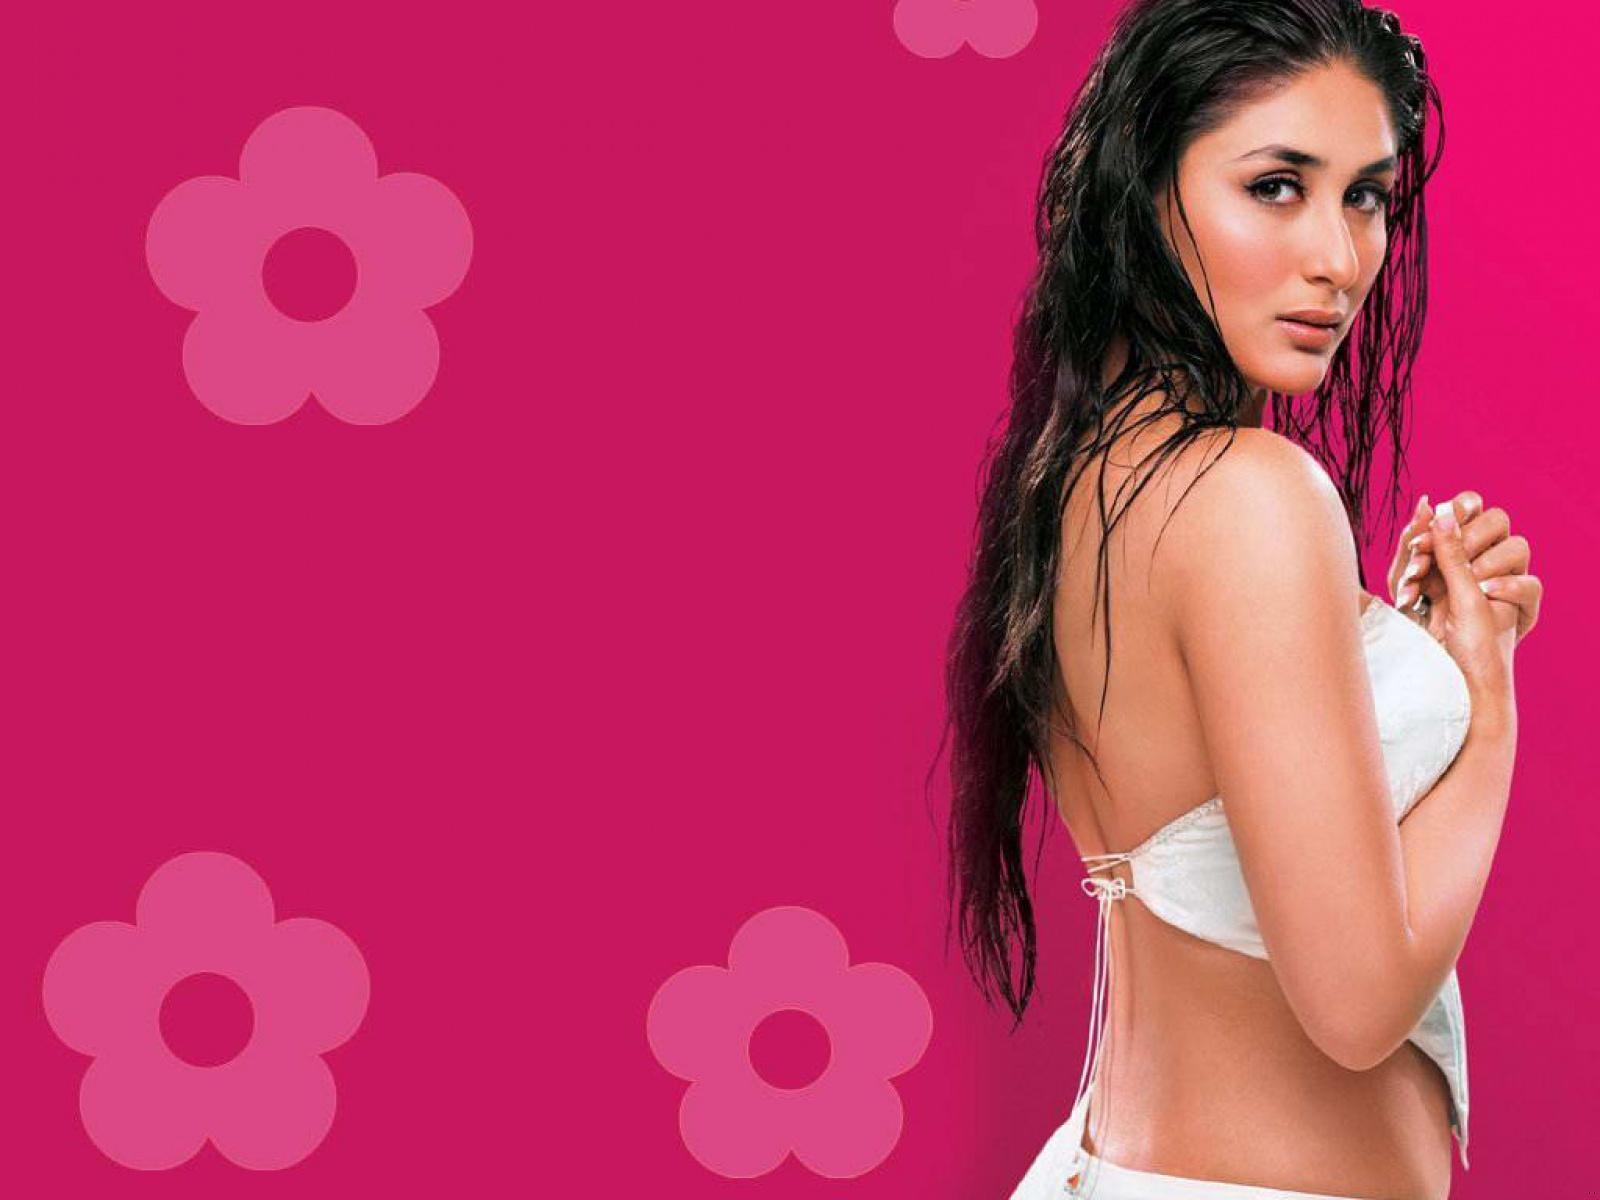 http://2.bp.blogspot.com/-tKGxZ6CBgEY/TwRwj9CIyKI/AAAAAAAAM58/Y8w7RCyOk-Q/s1600/ek_main_aur_ekk_tu-Kareena_Kapoor_dance_new_song_back_less.jpg